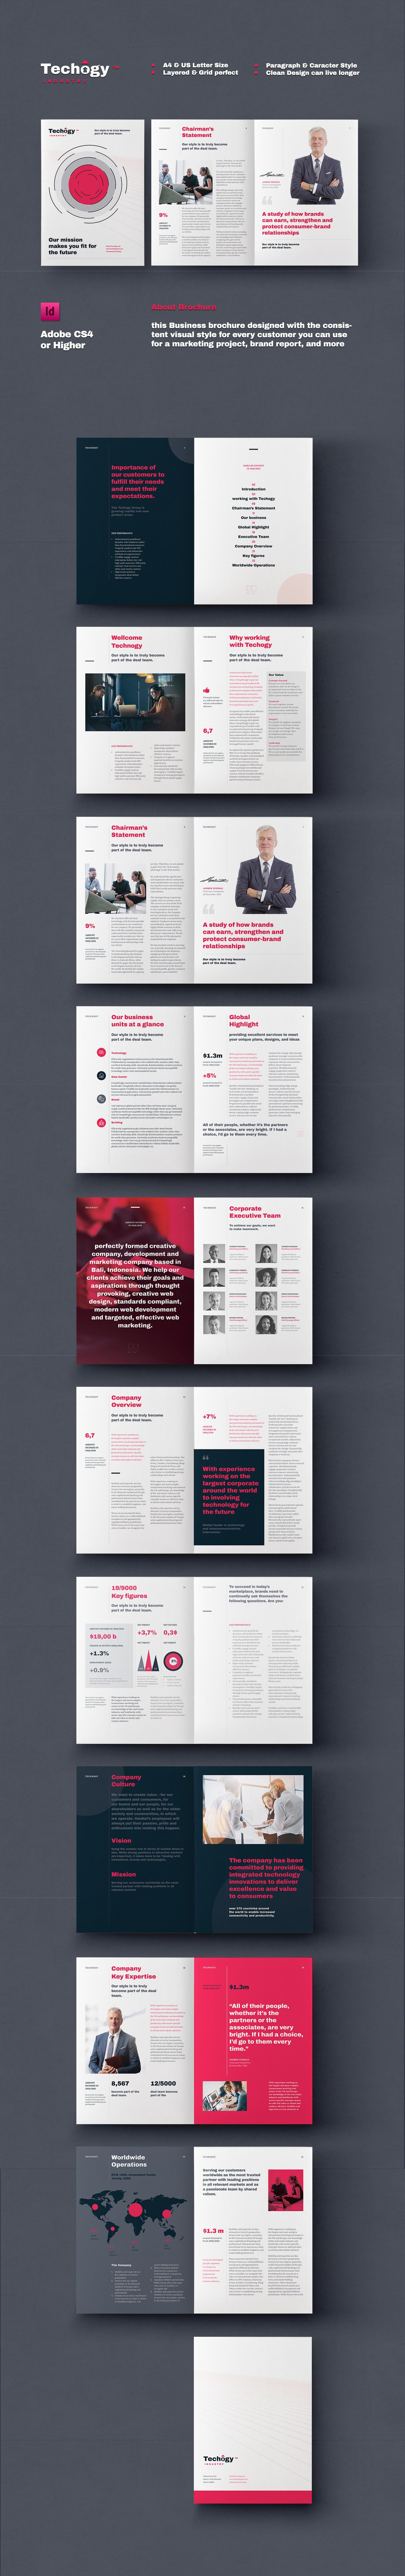 annual report template brochure brochure design Brochure Template business company profile Corporate Brochure Proposal report template simple brochure